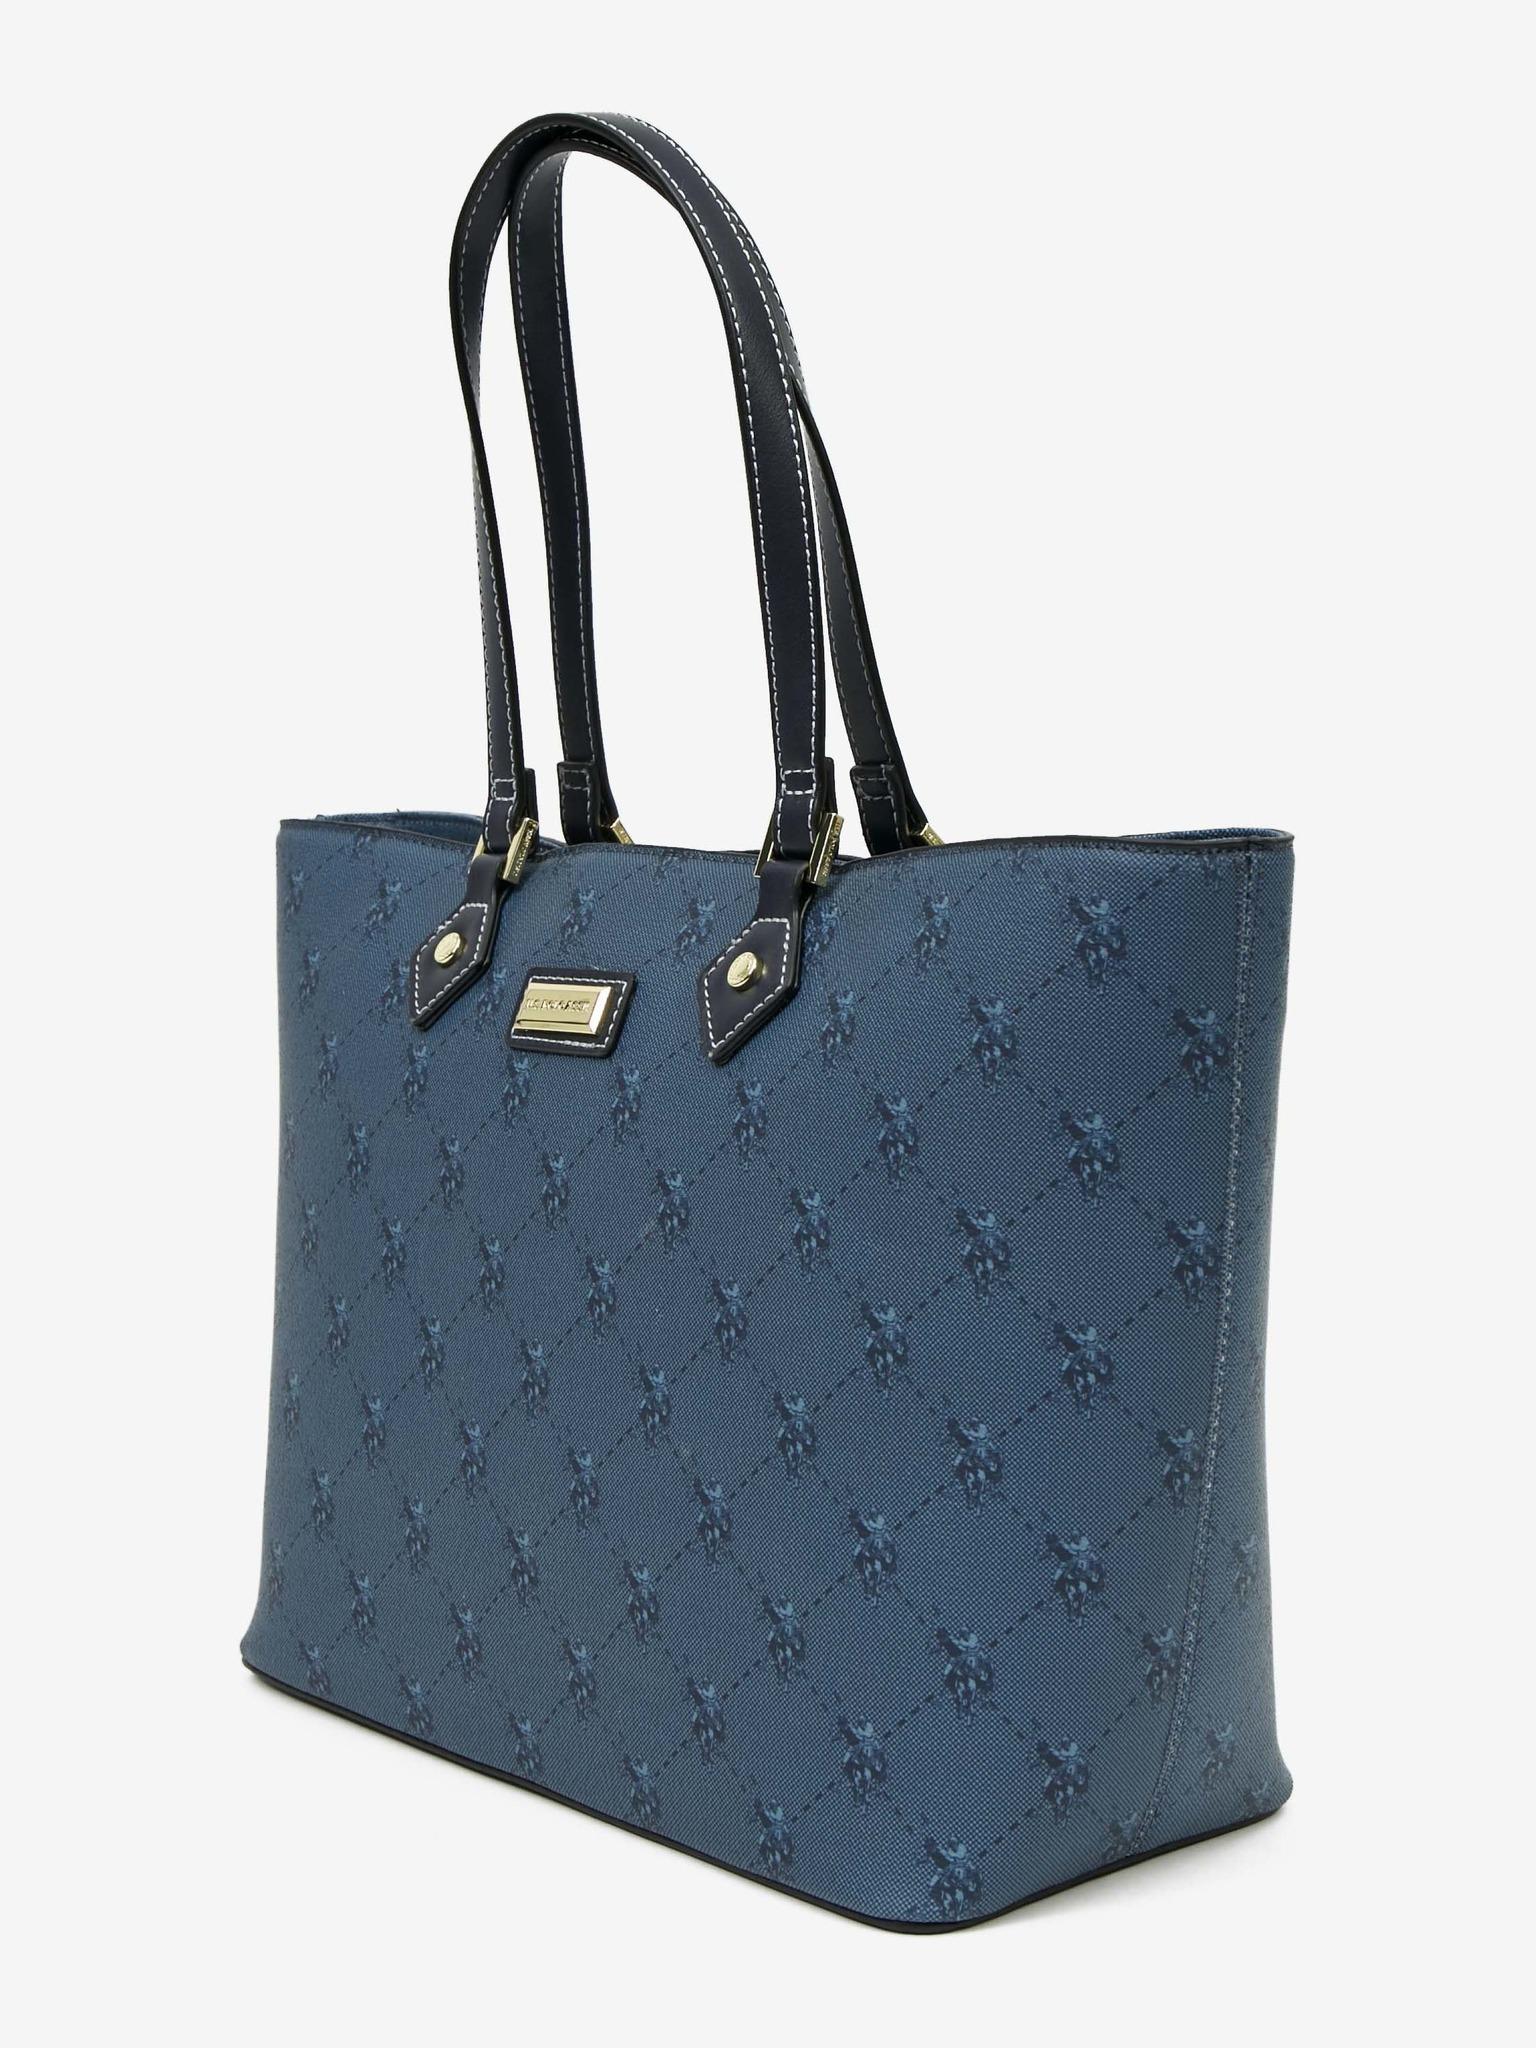 U.S. Polo Assn. Borsetta donna blu  L